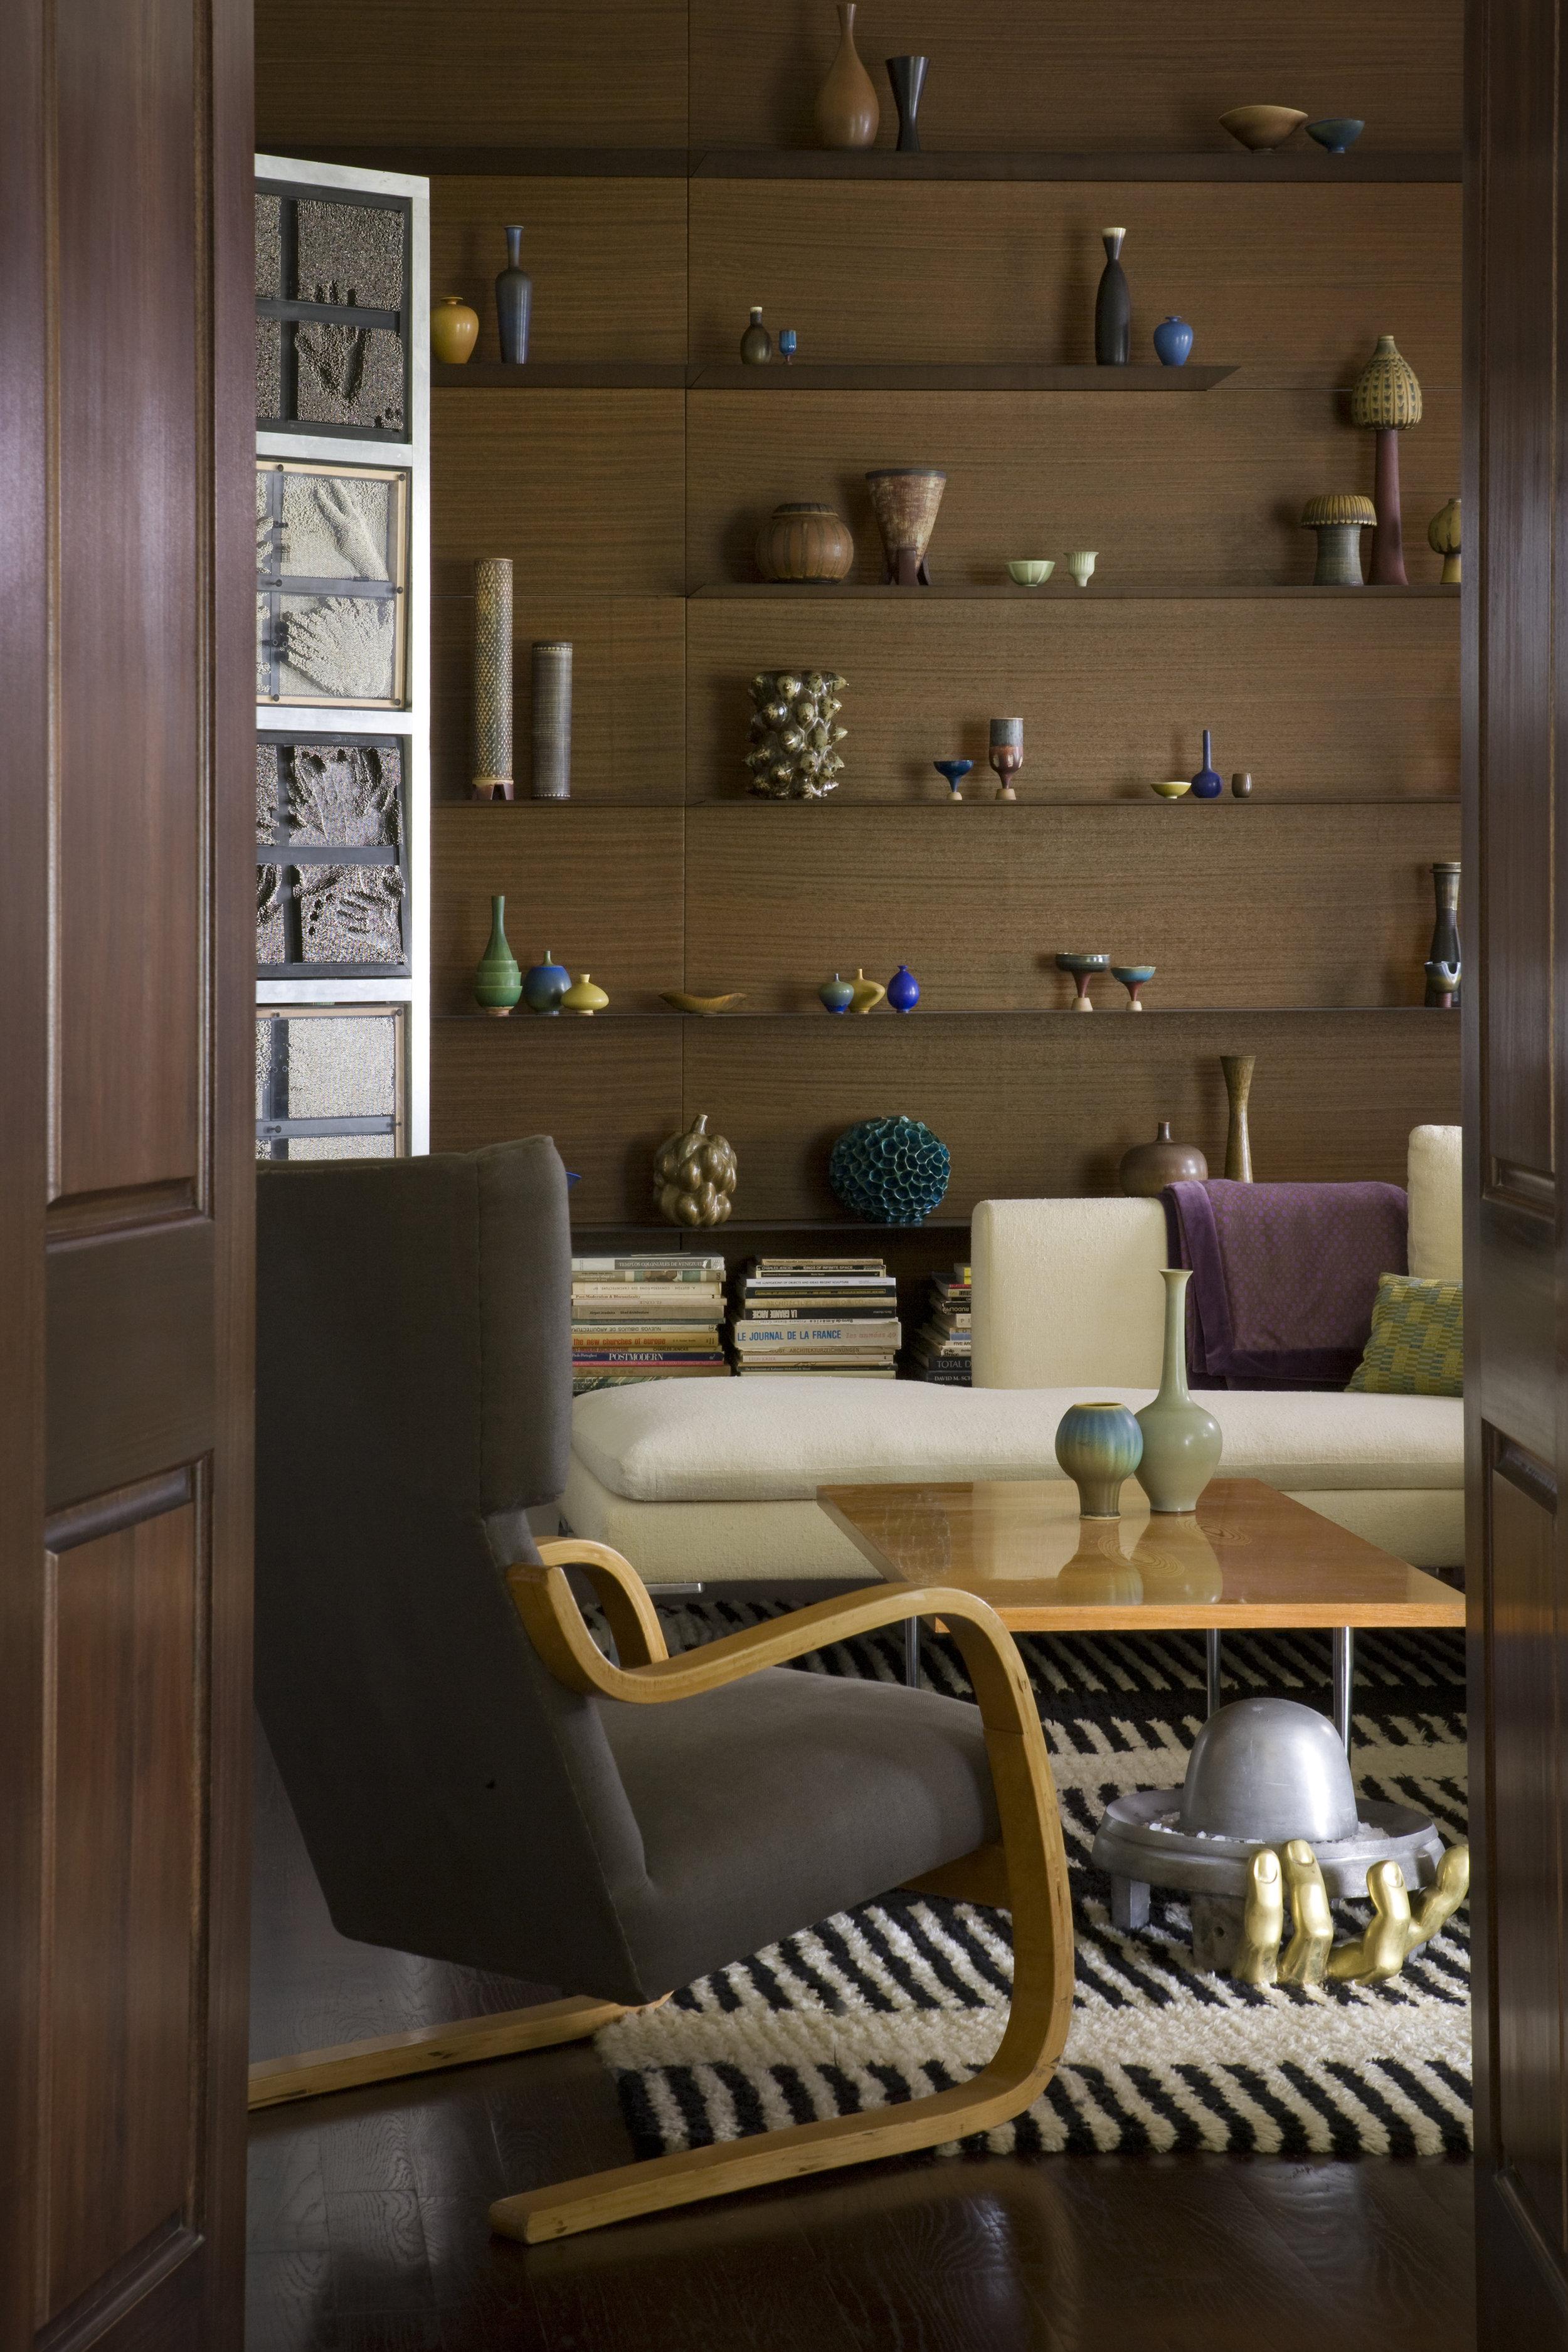 luis-pons-design-interior_5.jpg